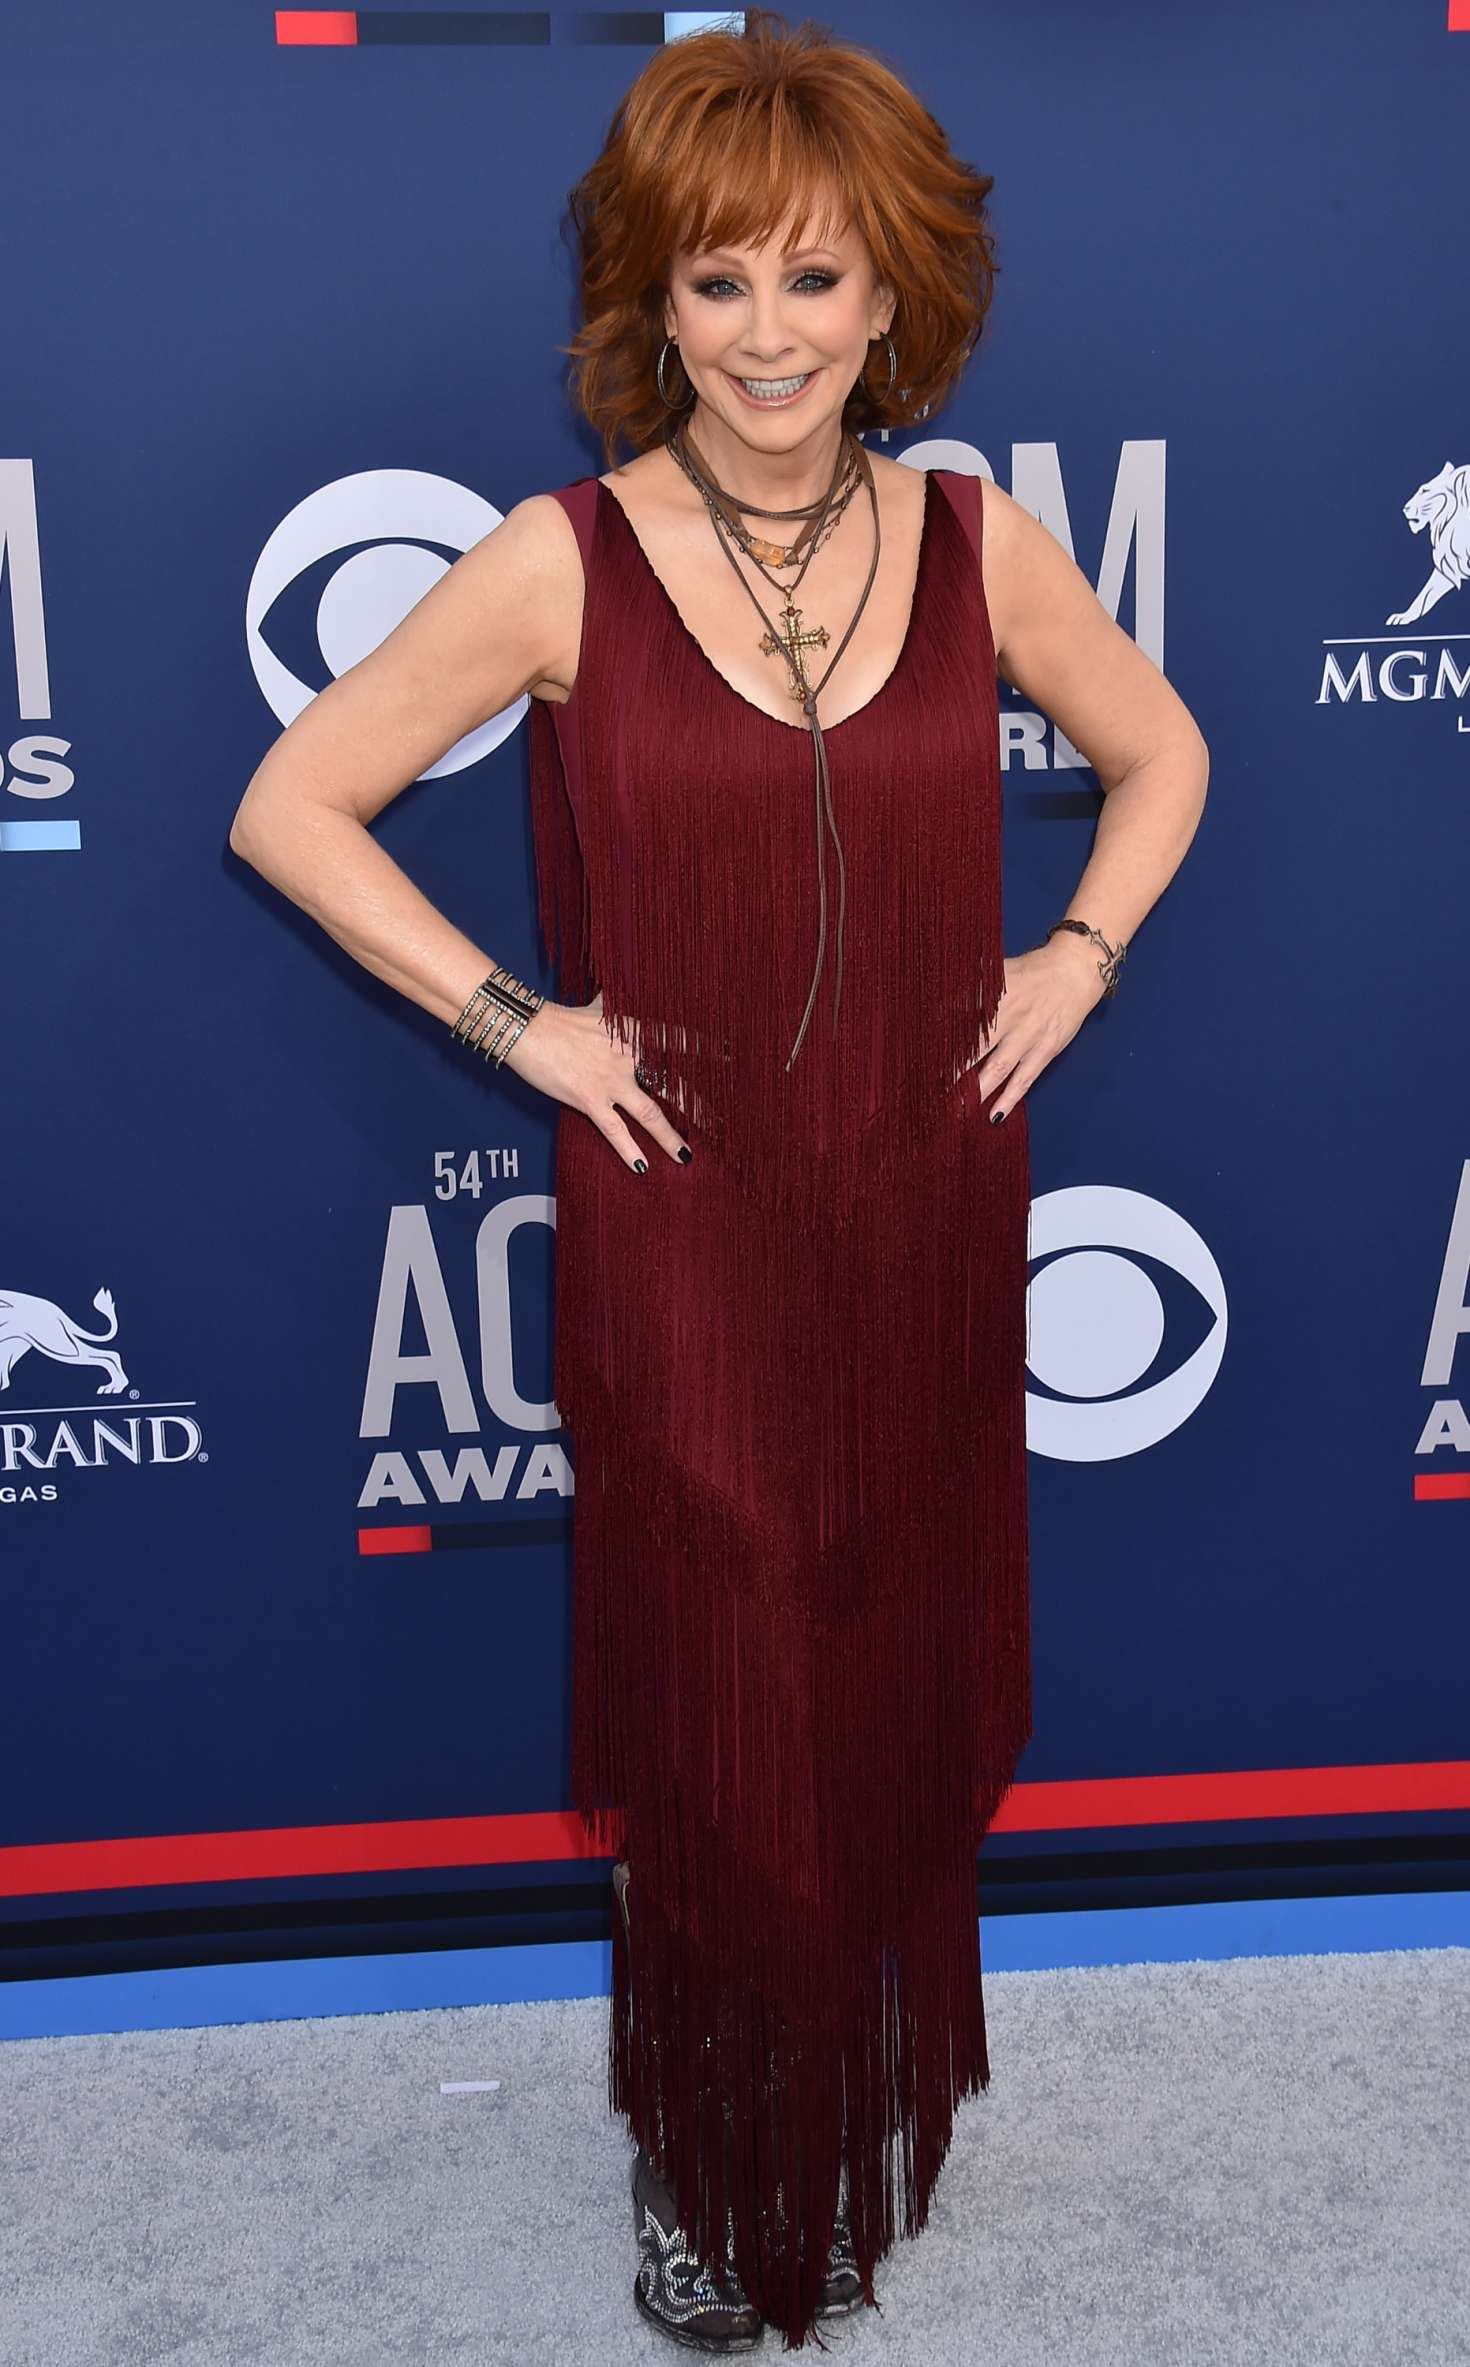 Reba Mcentire 2019 : Reba McEntire: 2019 Academy of Country Music Awards -09